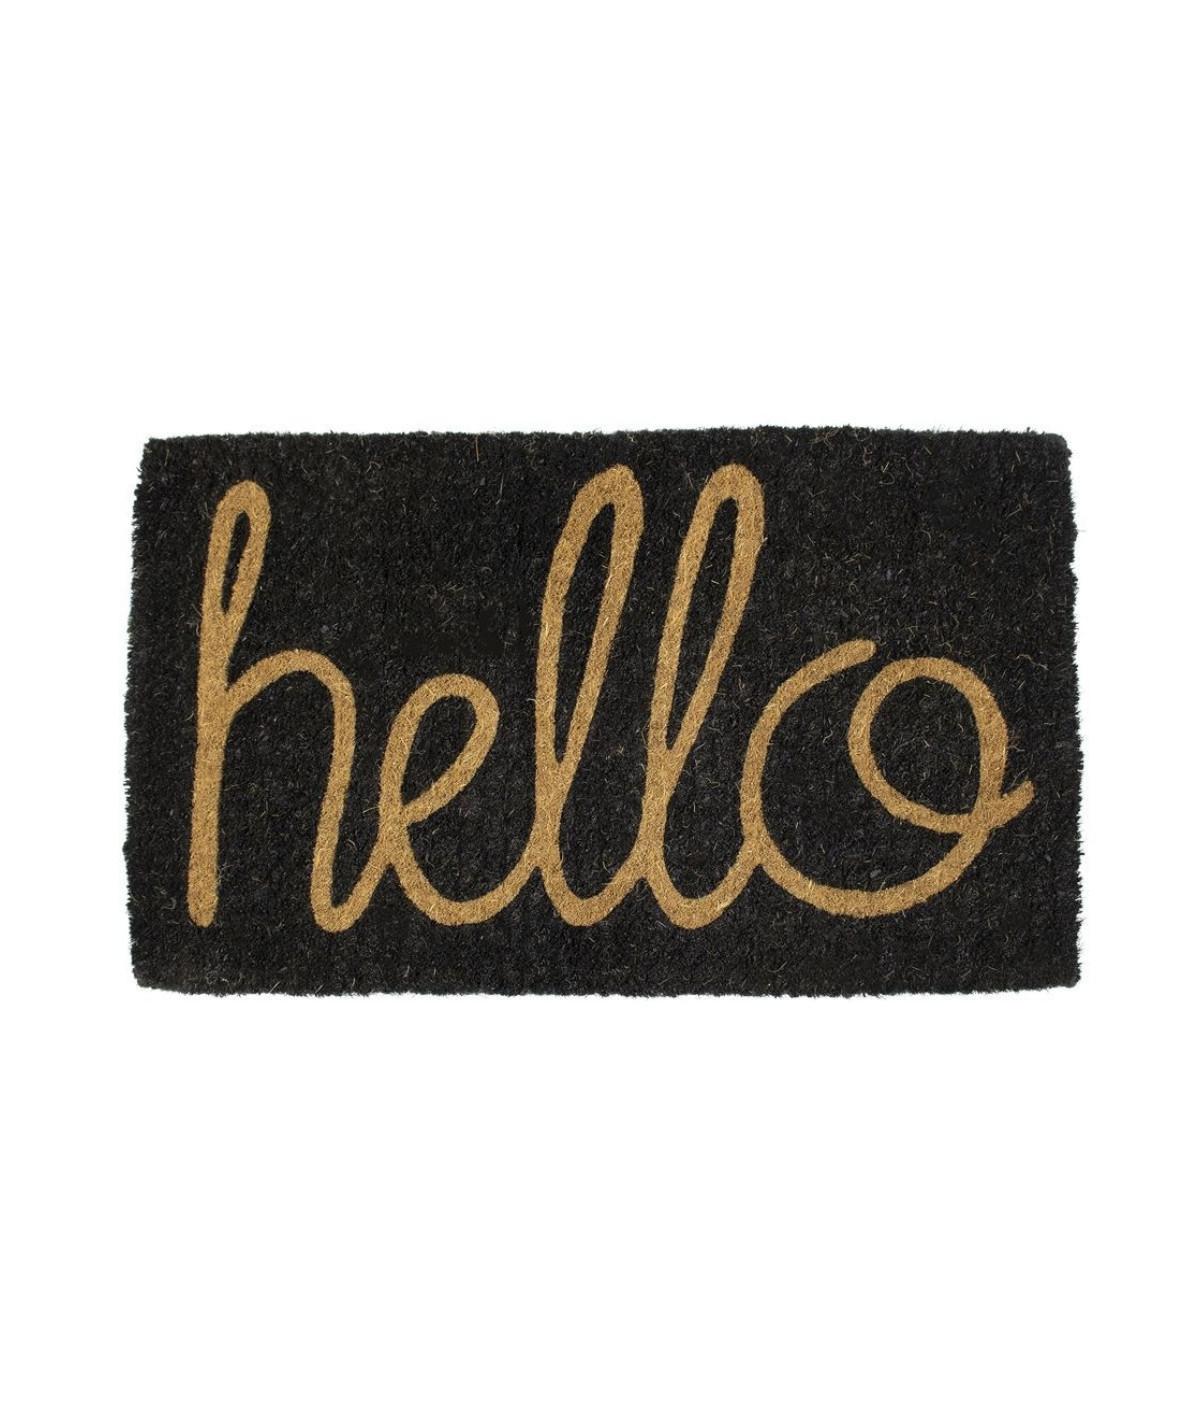 Paillasson coco fait main 75x45cm - Hello |YESDEKO